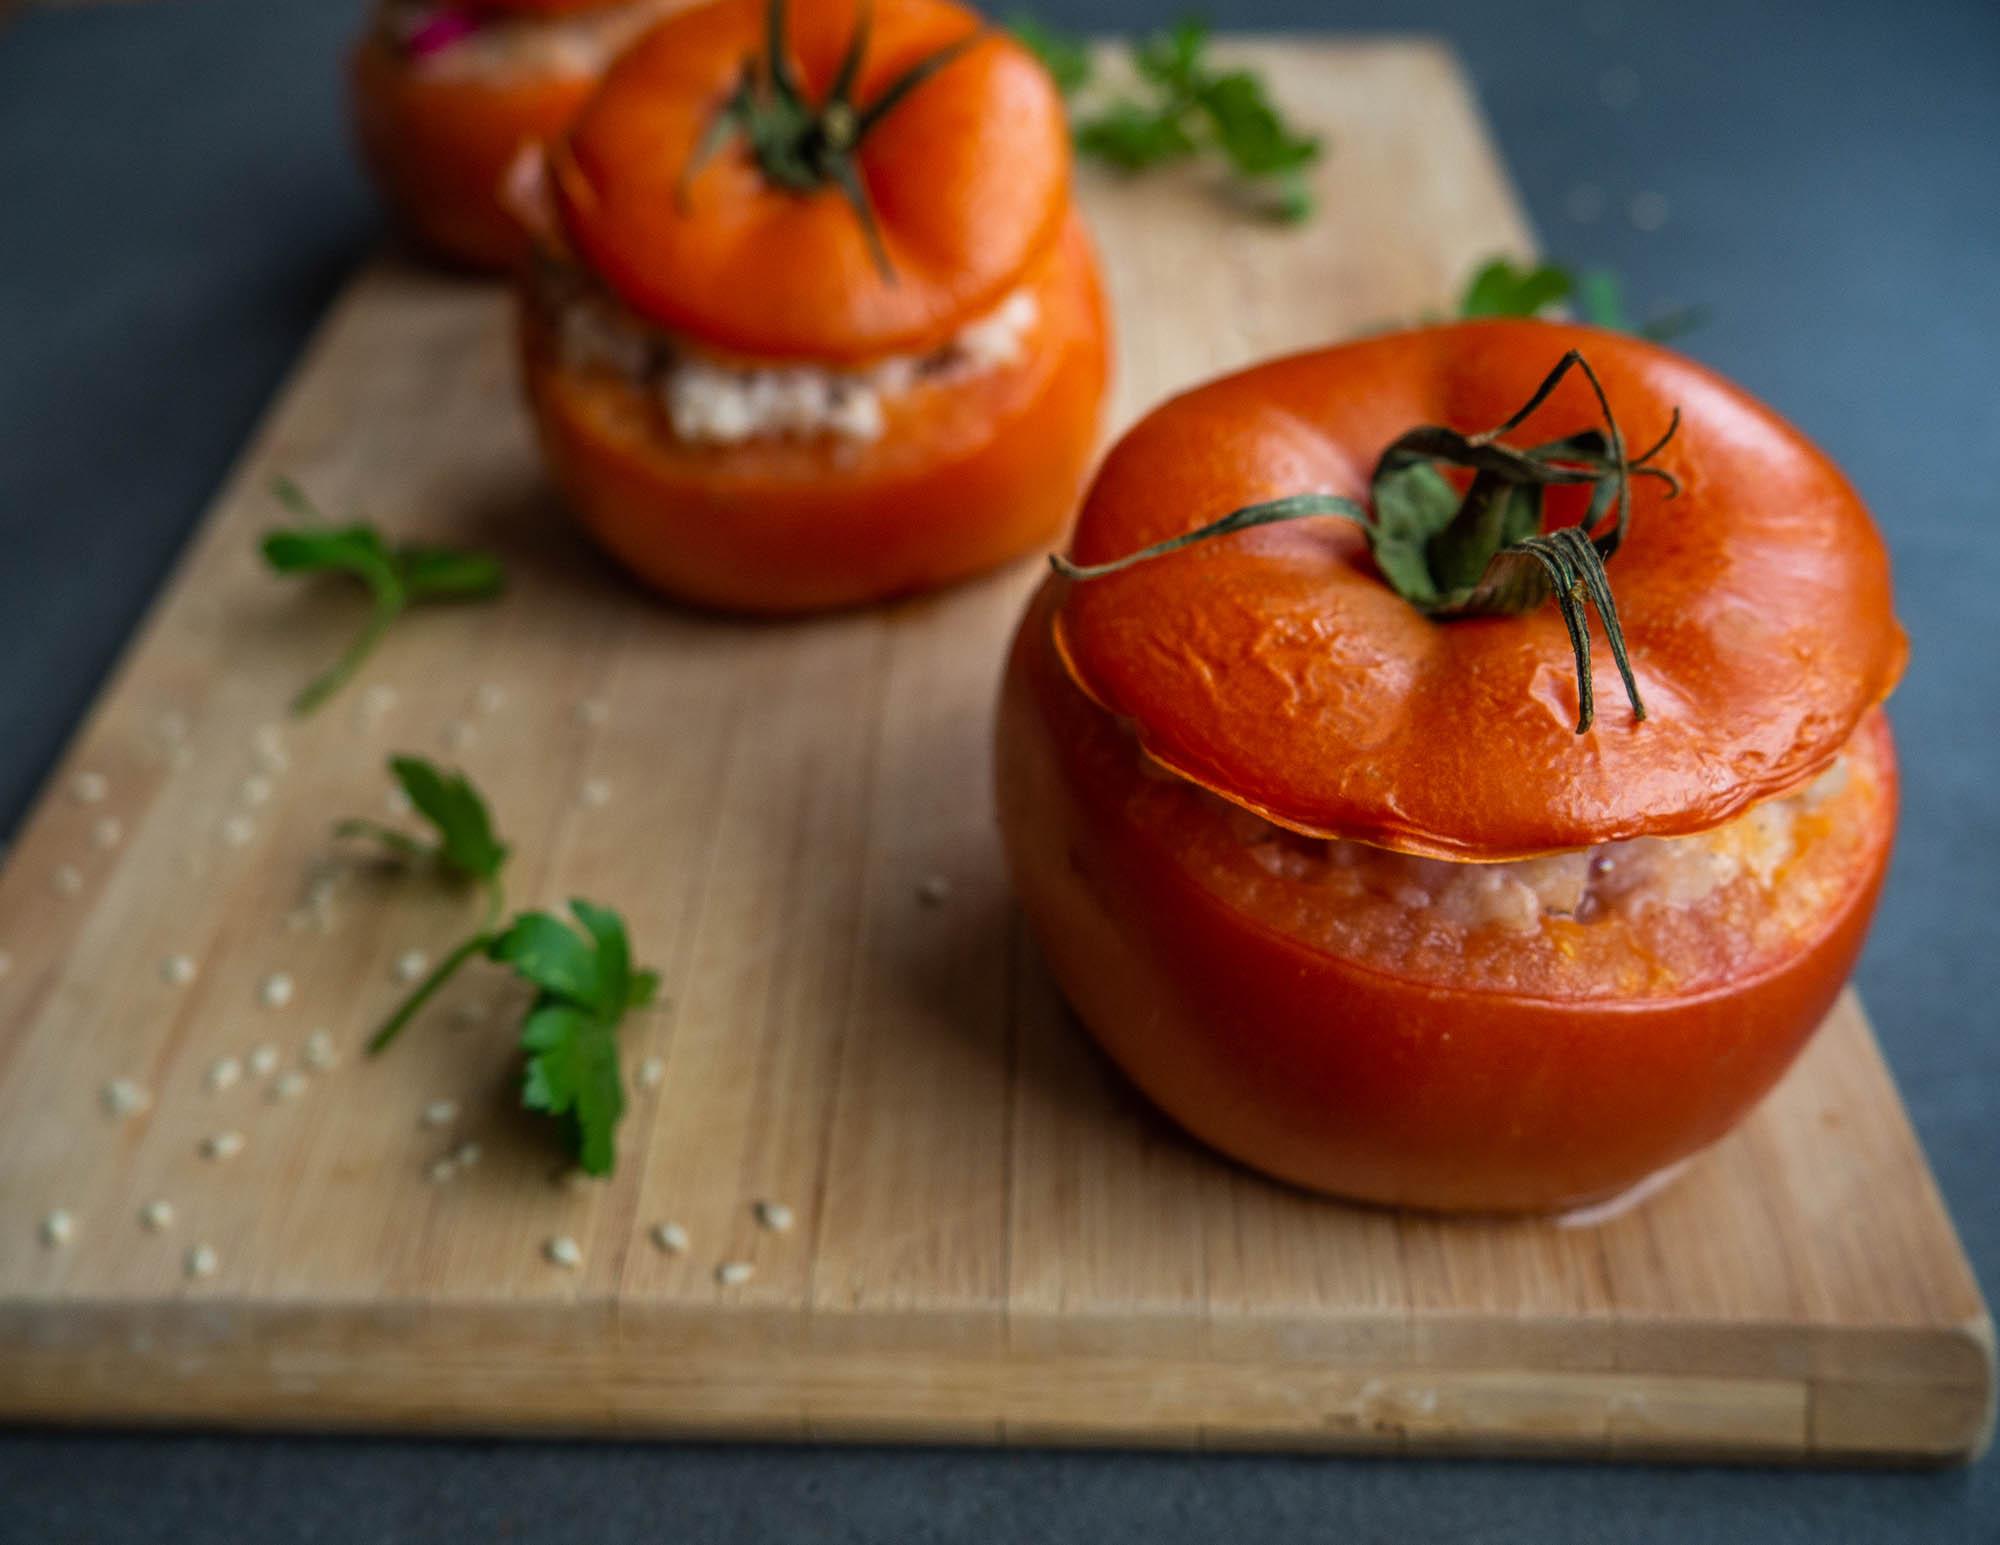 Stuffed Tomatoes With Barley Groats